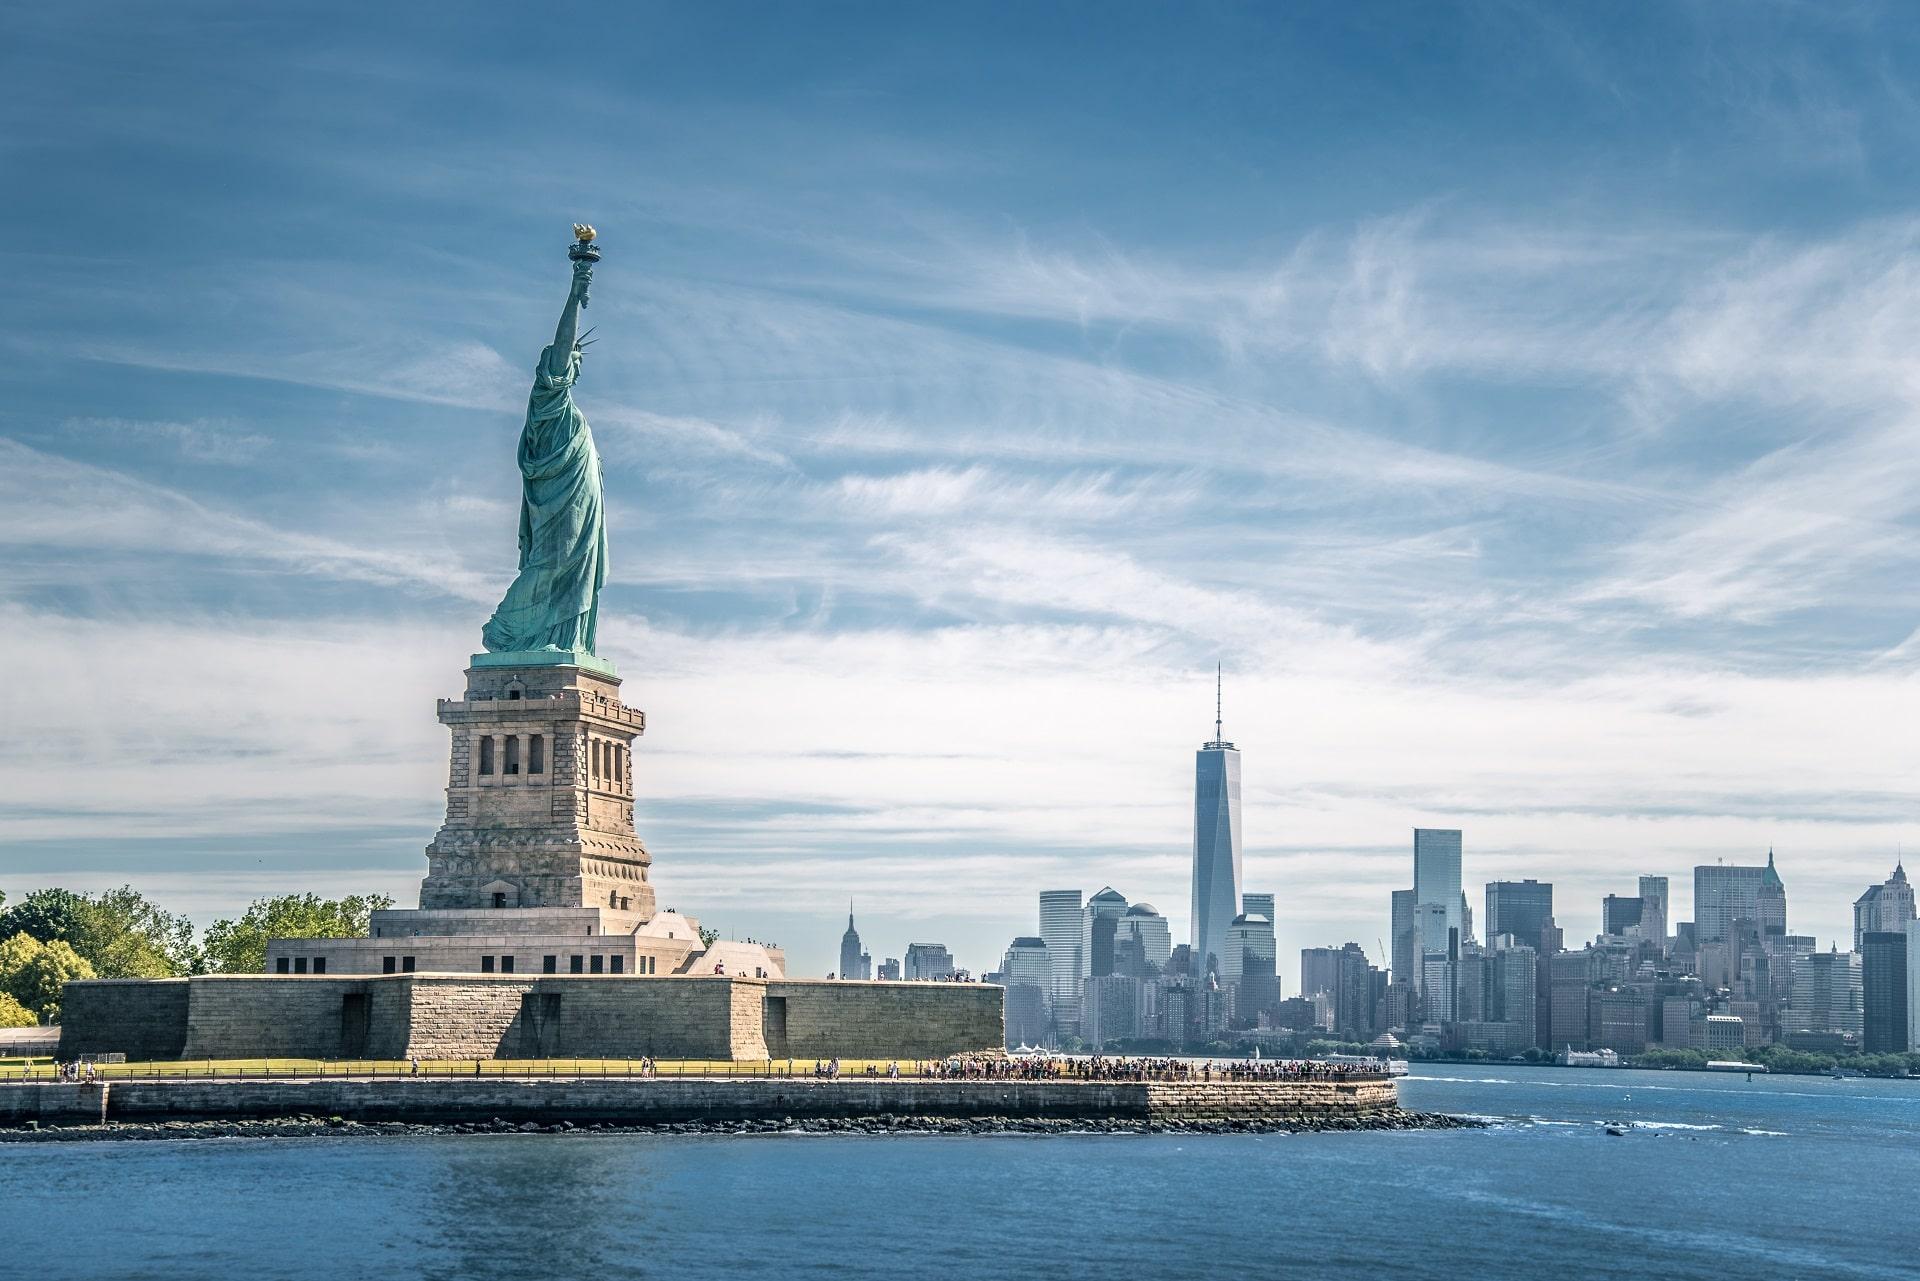 New-York-Statue-Of-Liberty